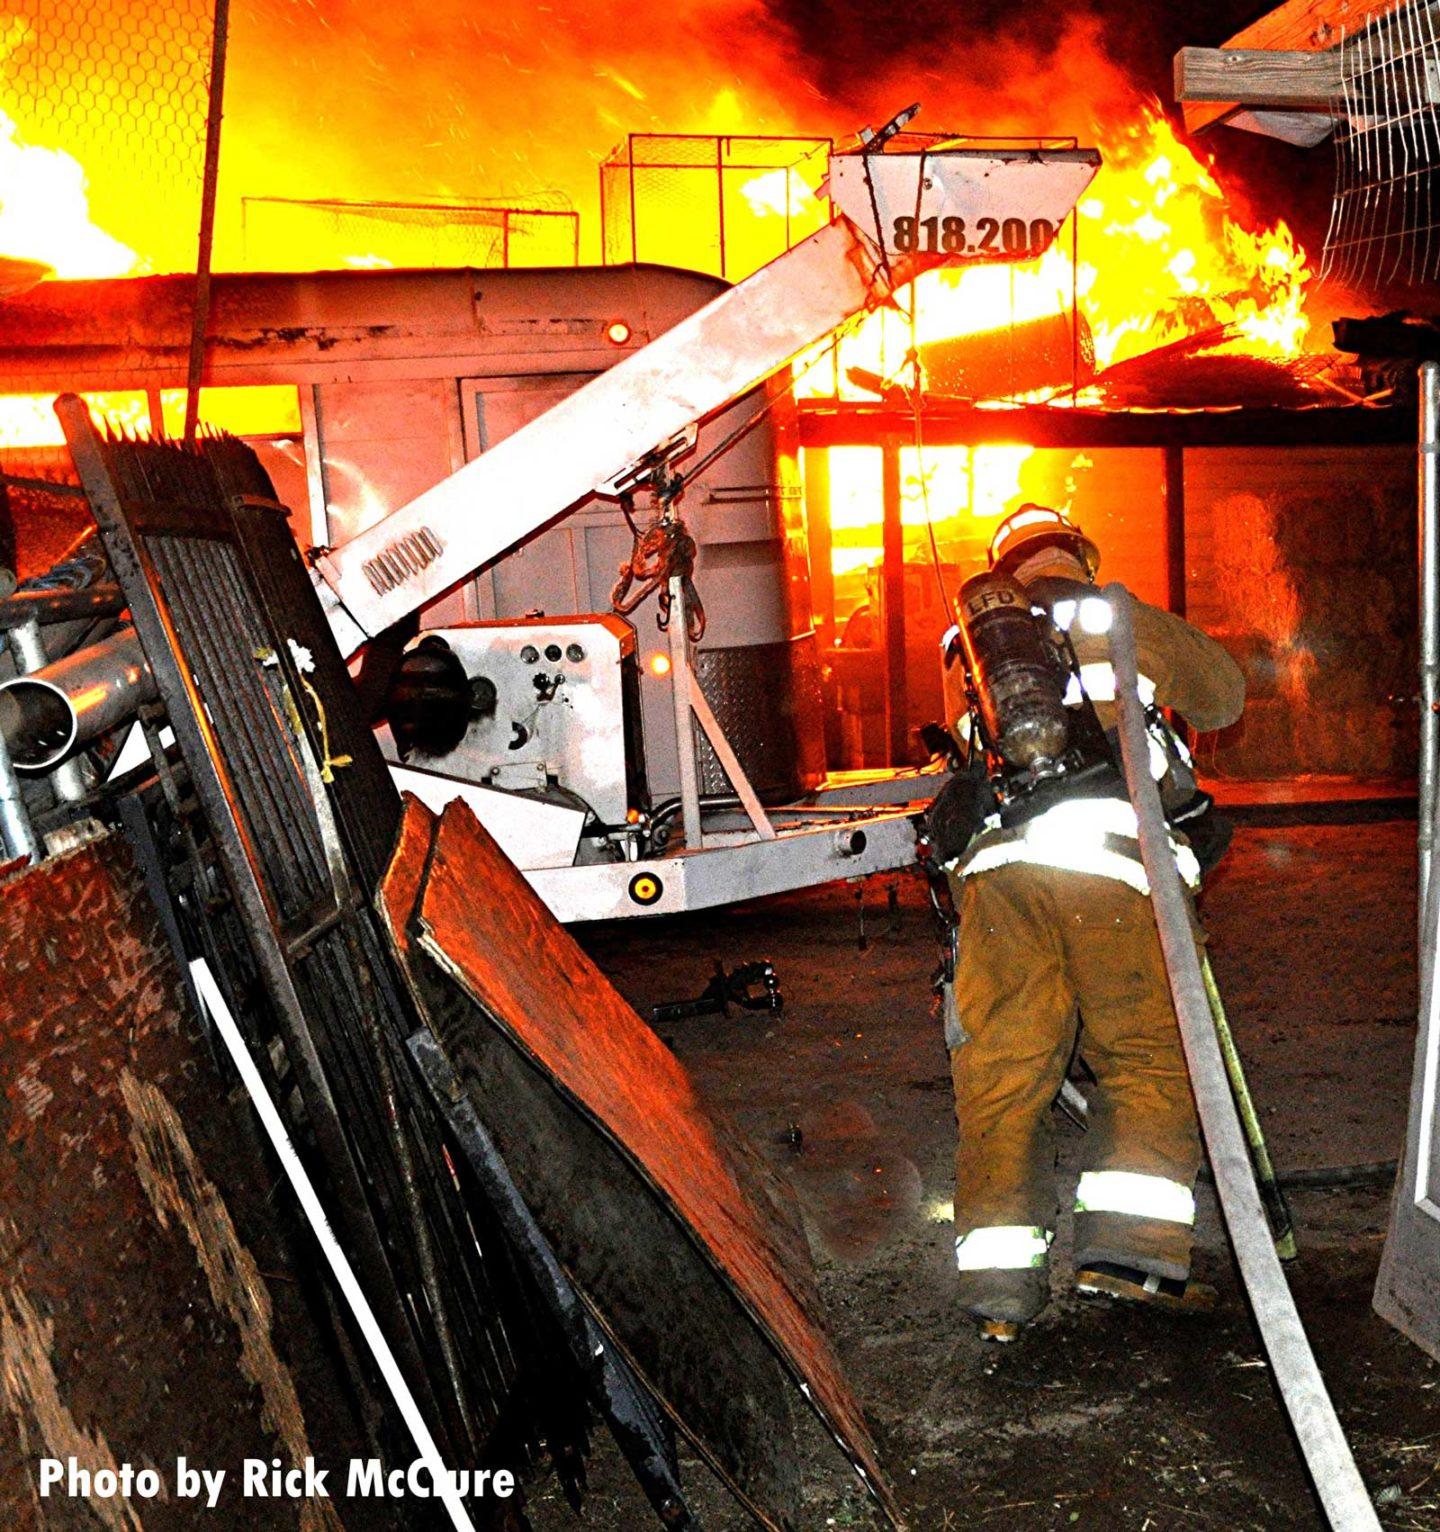 A firefighter pulls a hoseline toward massive flames